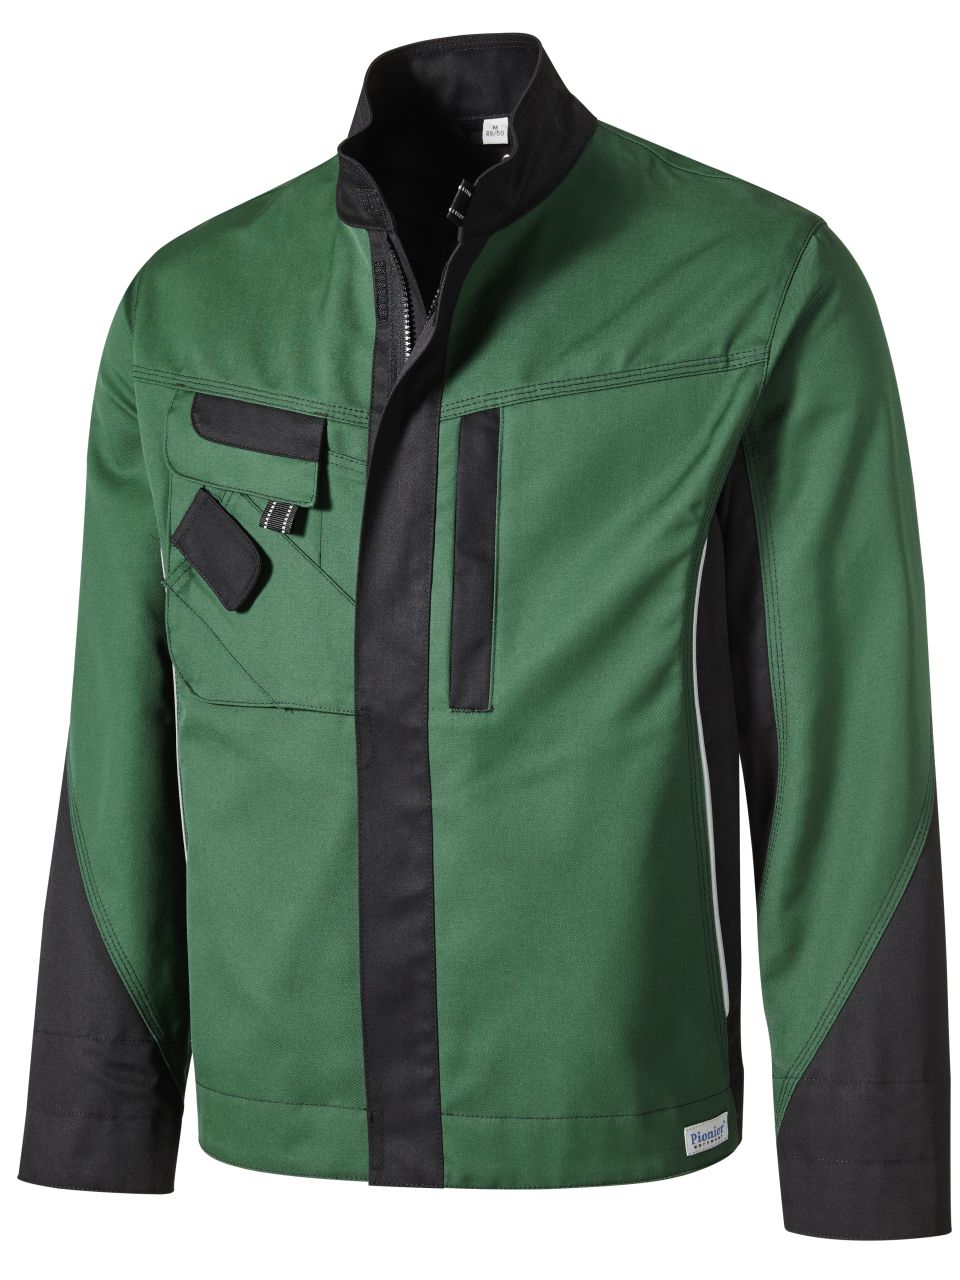 Arbeitsjacke Bundjacke Jacke schwarz//grün Gr L